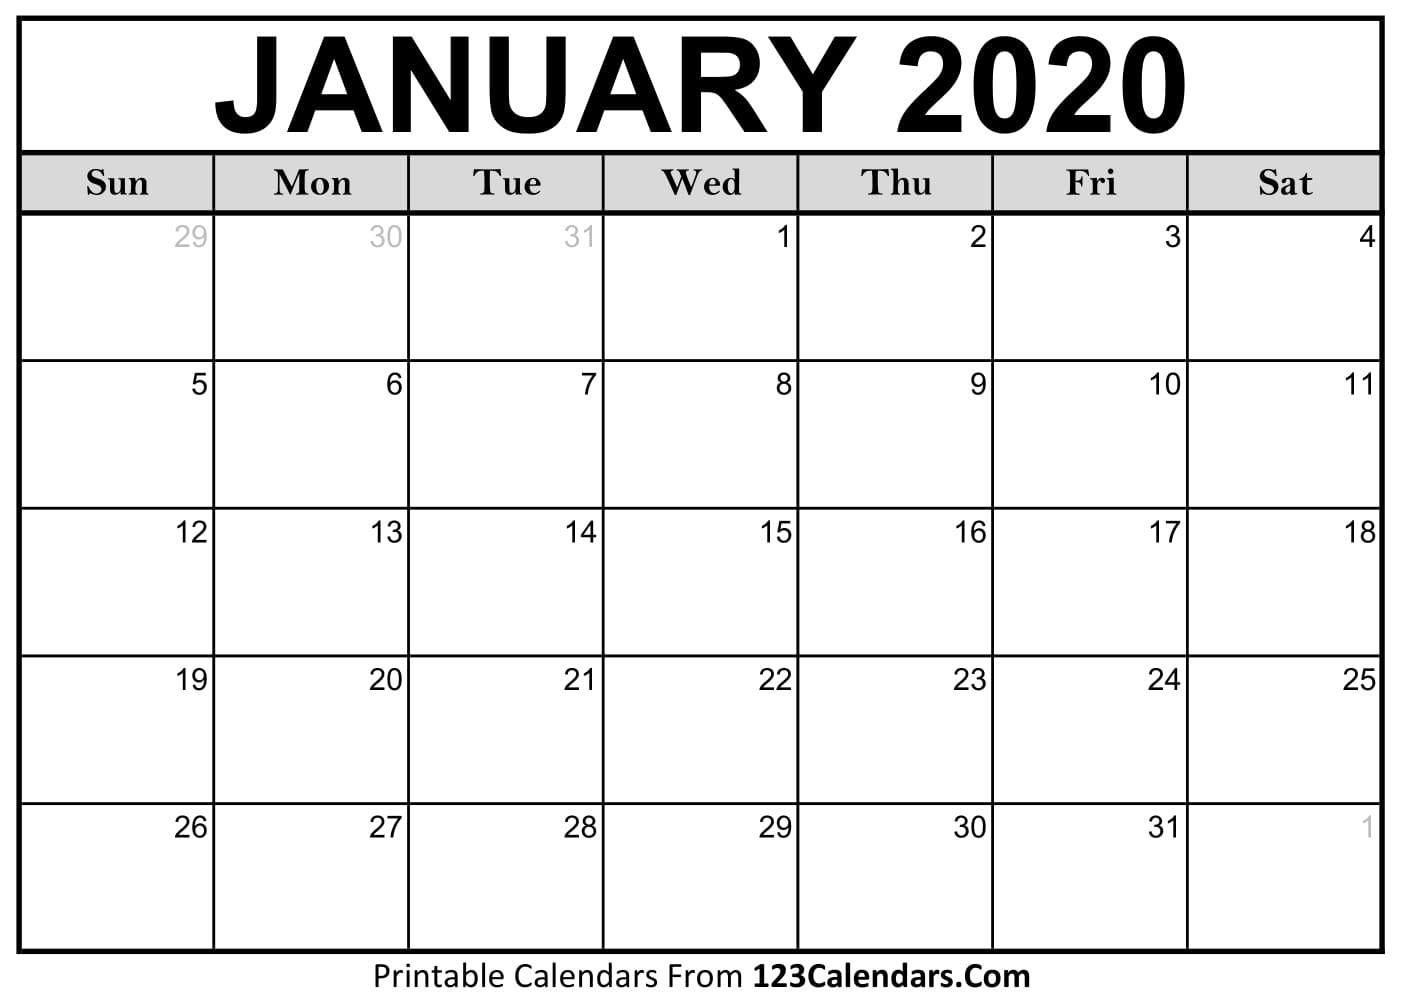 Free Printable Calendar | 123Calendars-Blank Calendar 2020 To Fill In